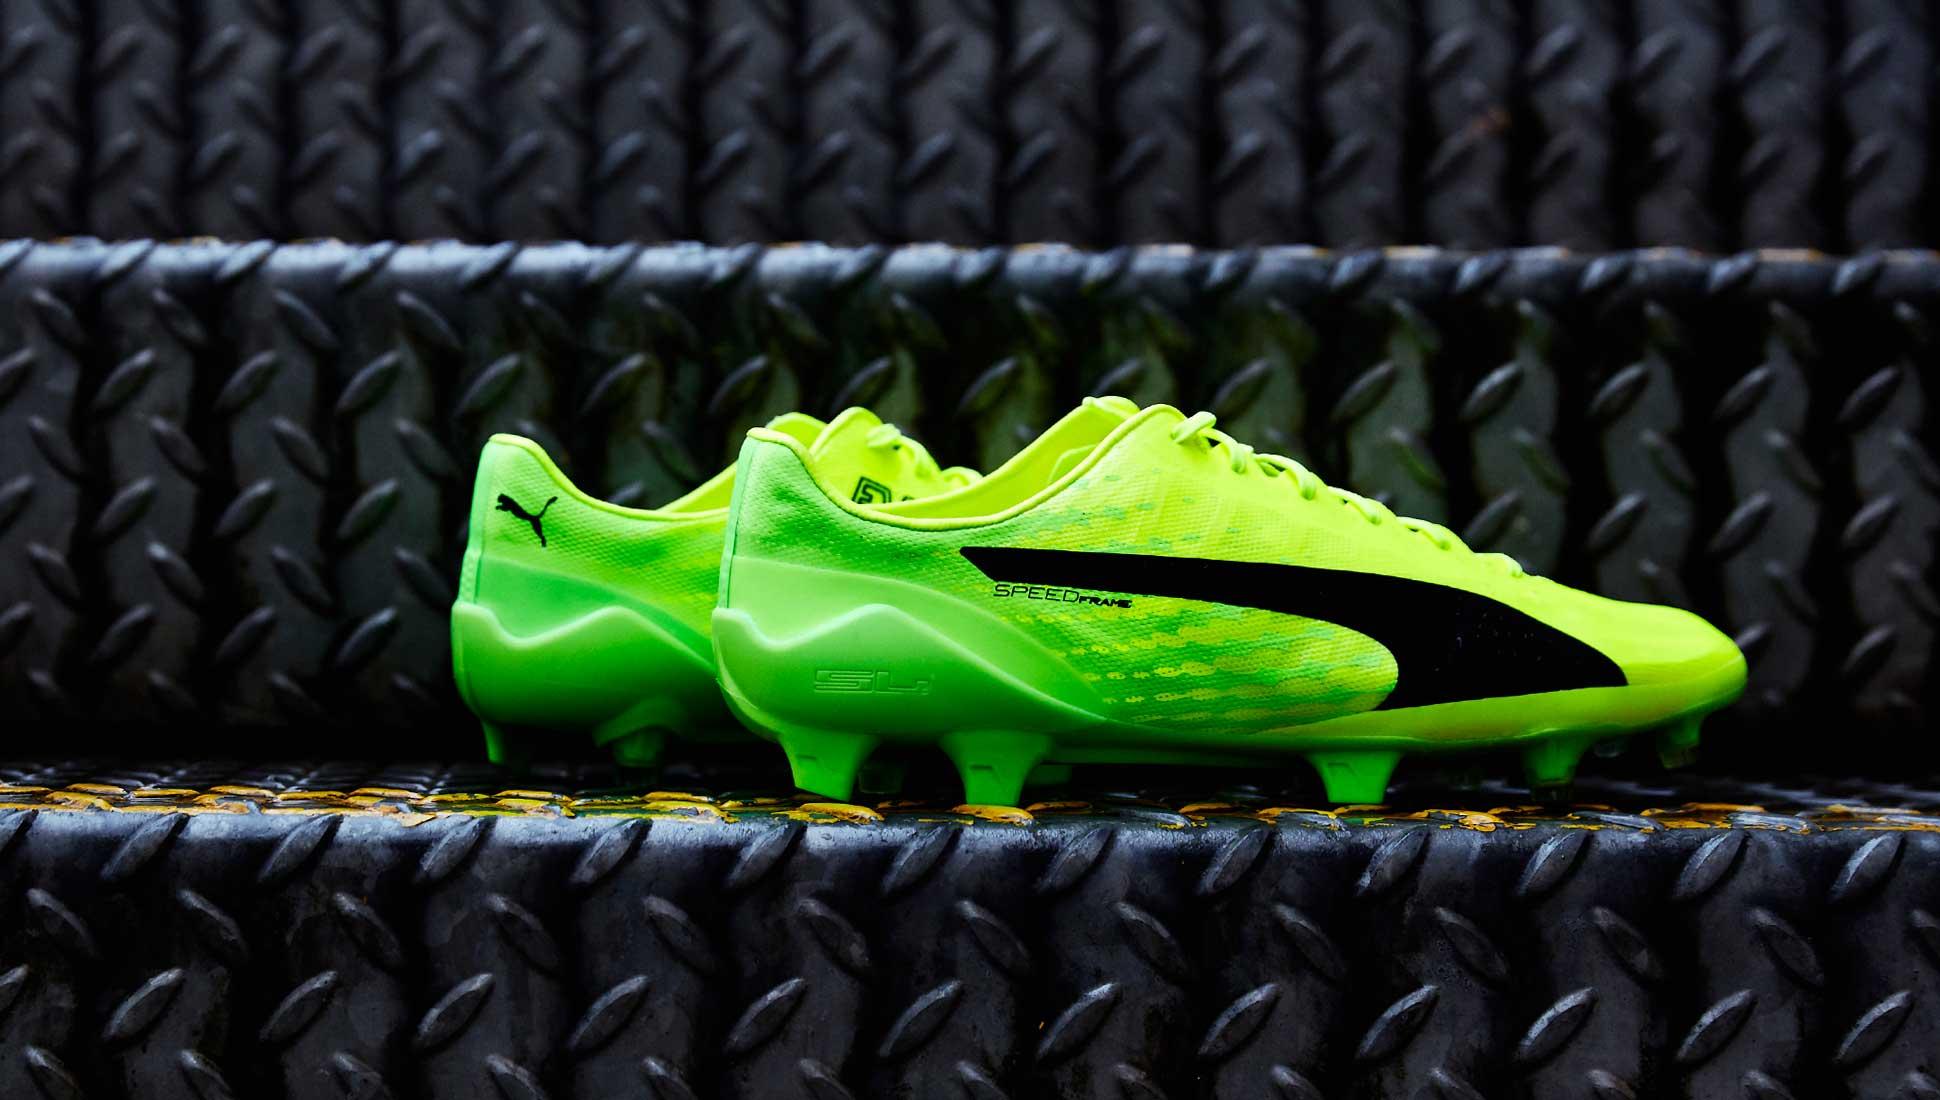 8a9094c4ad9545 PUMA evoSPEED 17.SL Football Boots - SoccerBible